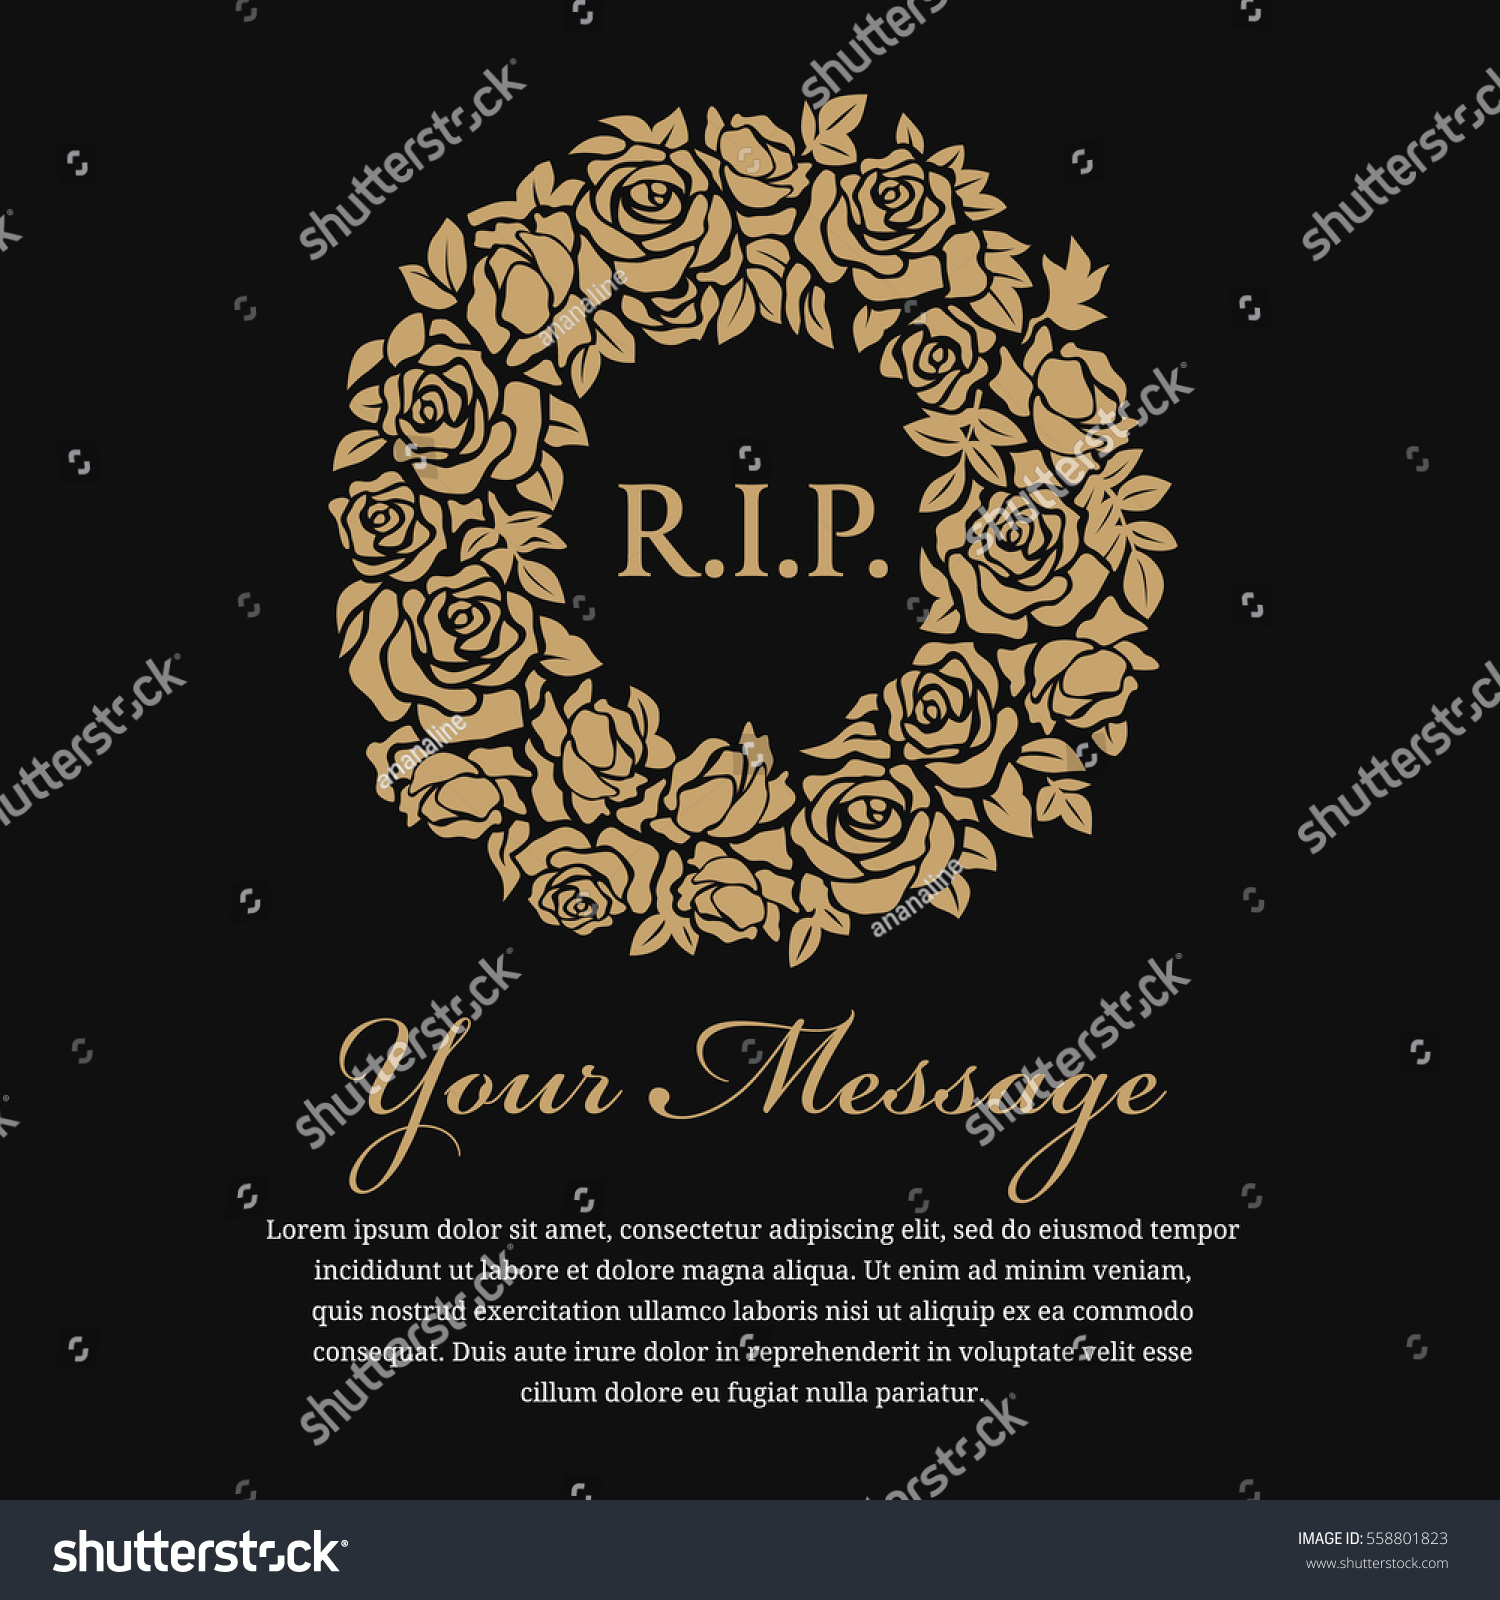 Funeral card rip text circle gold stock vector 558801823 funeral card rip text in circle gold wreath rose vector design jeuxipadfo Gallery